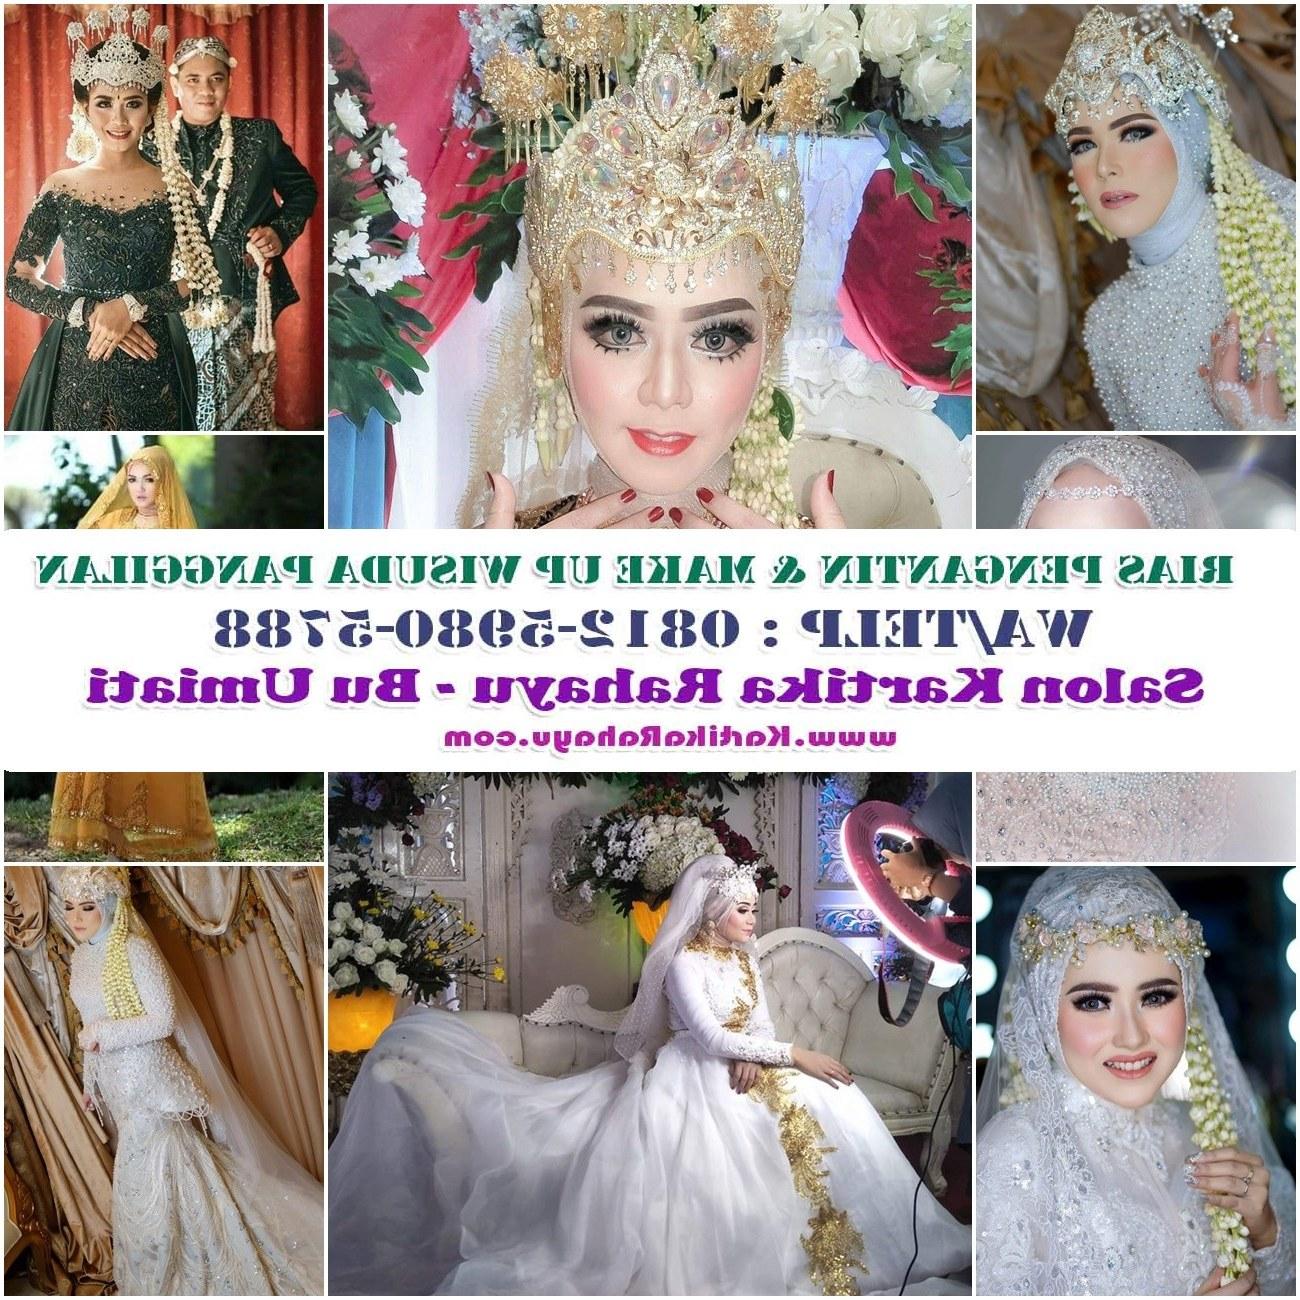 Model Sewa Baju Pengantin Muslimah Modern Jxdu Make Up Wisuda Malang Kota Malang Jawa Timur